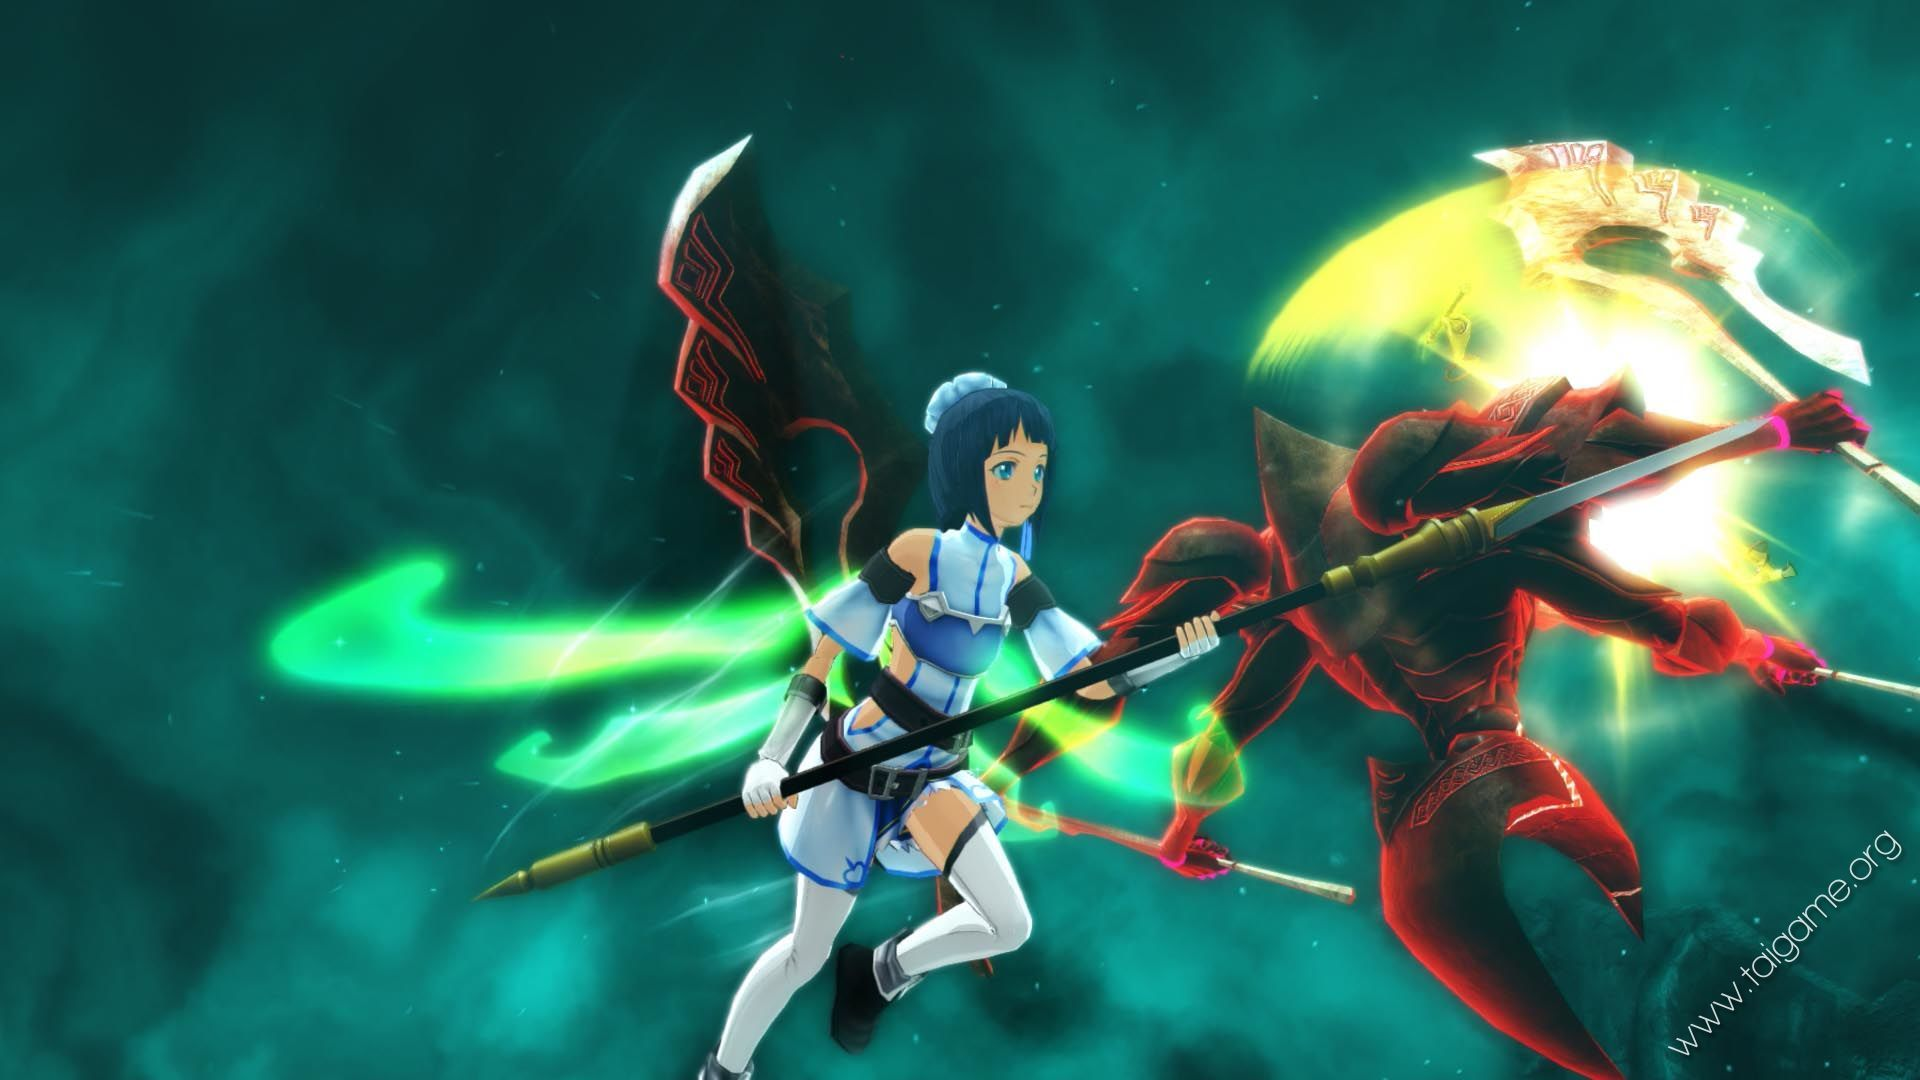 Sword Art Online Deluxe Edition picture6 Accel World VS. Sword Art Online  Deluxe Edition picture7 ...